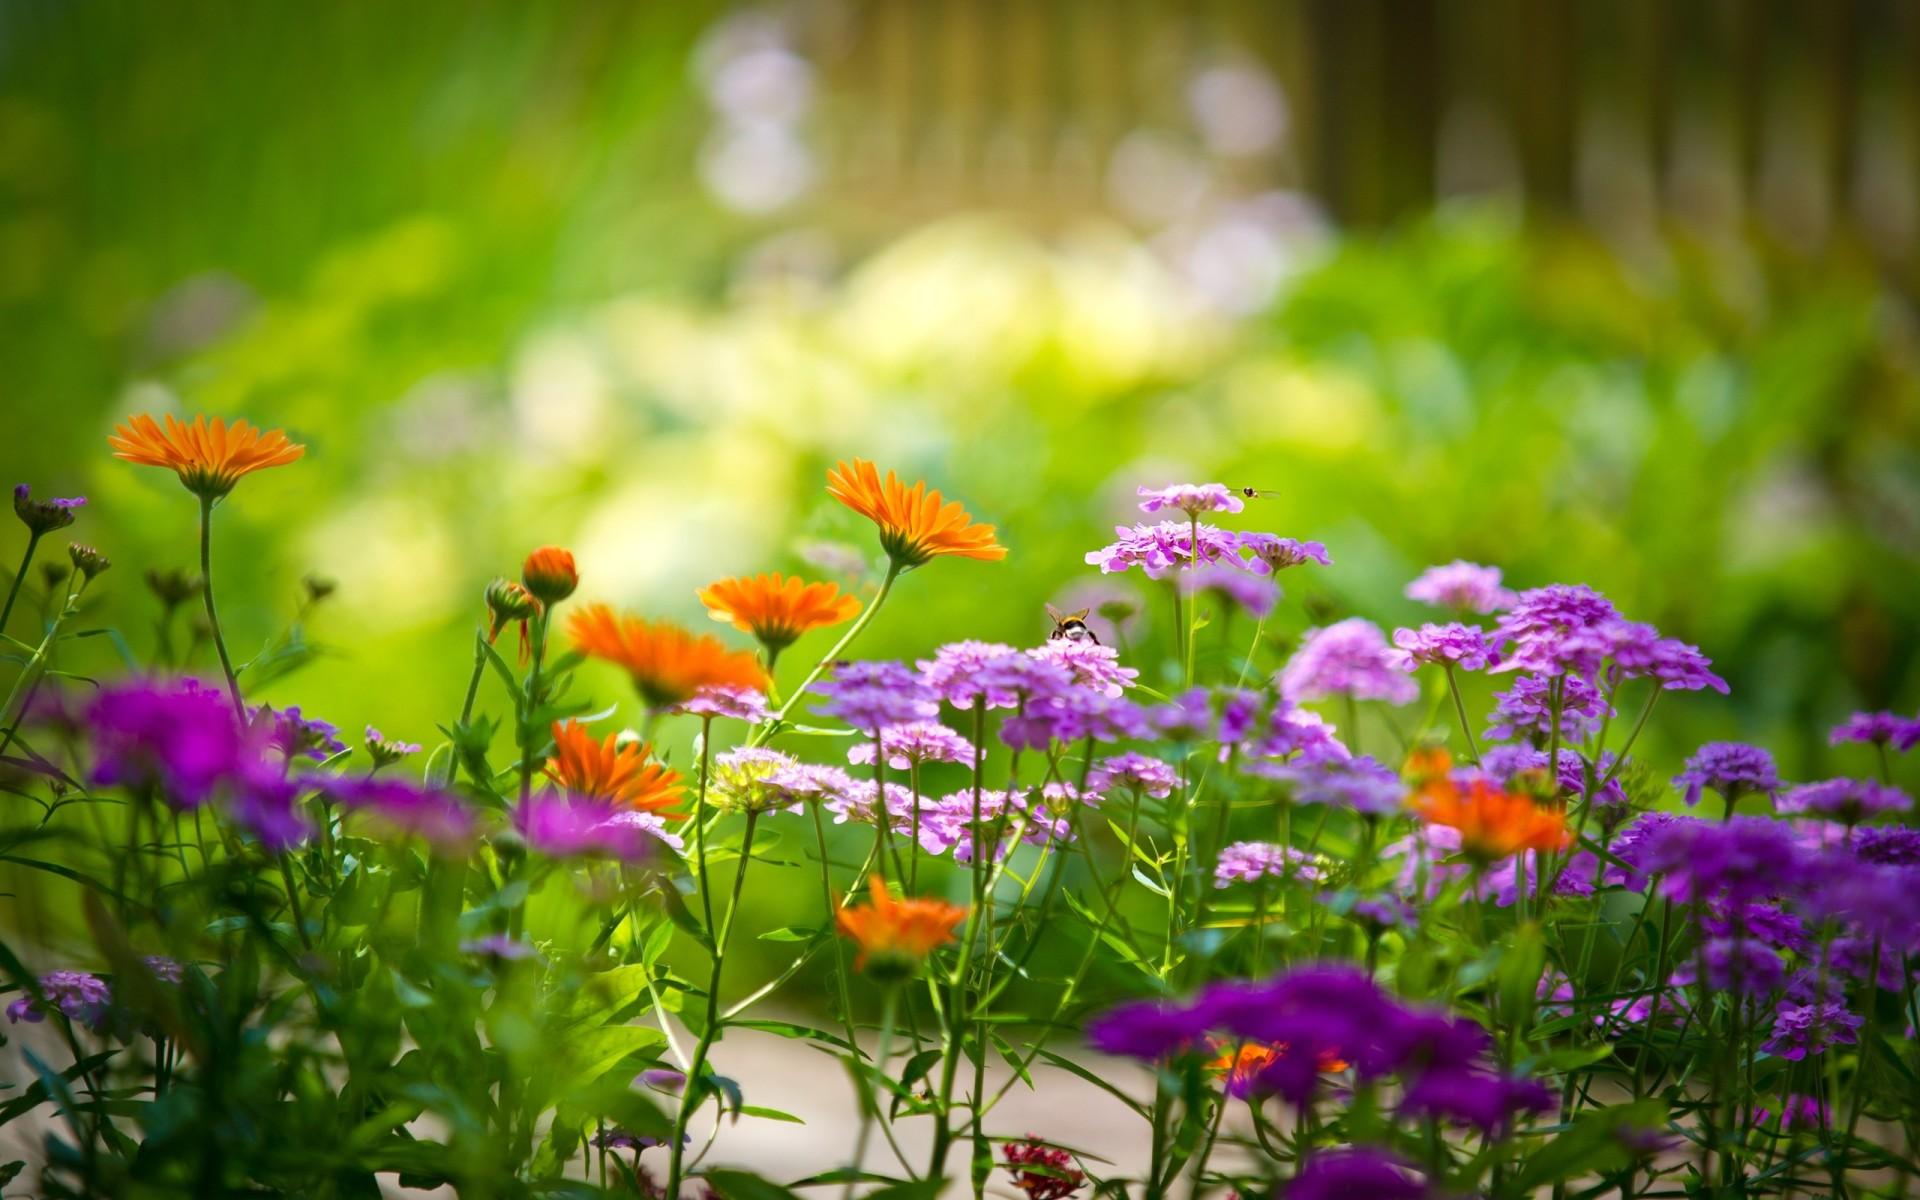 hd garden images